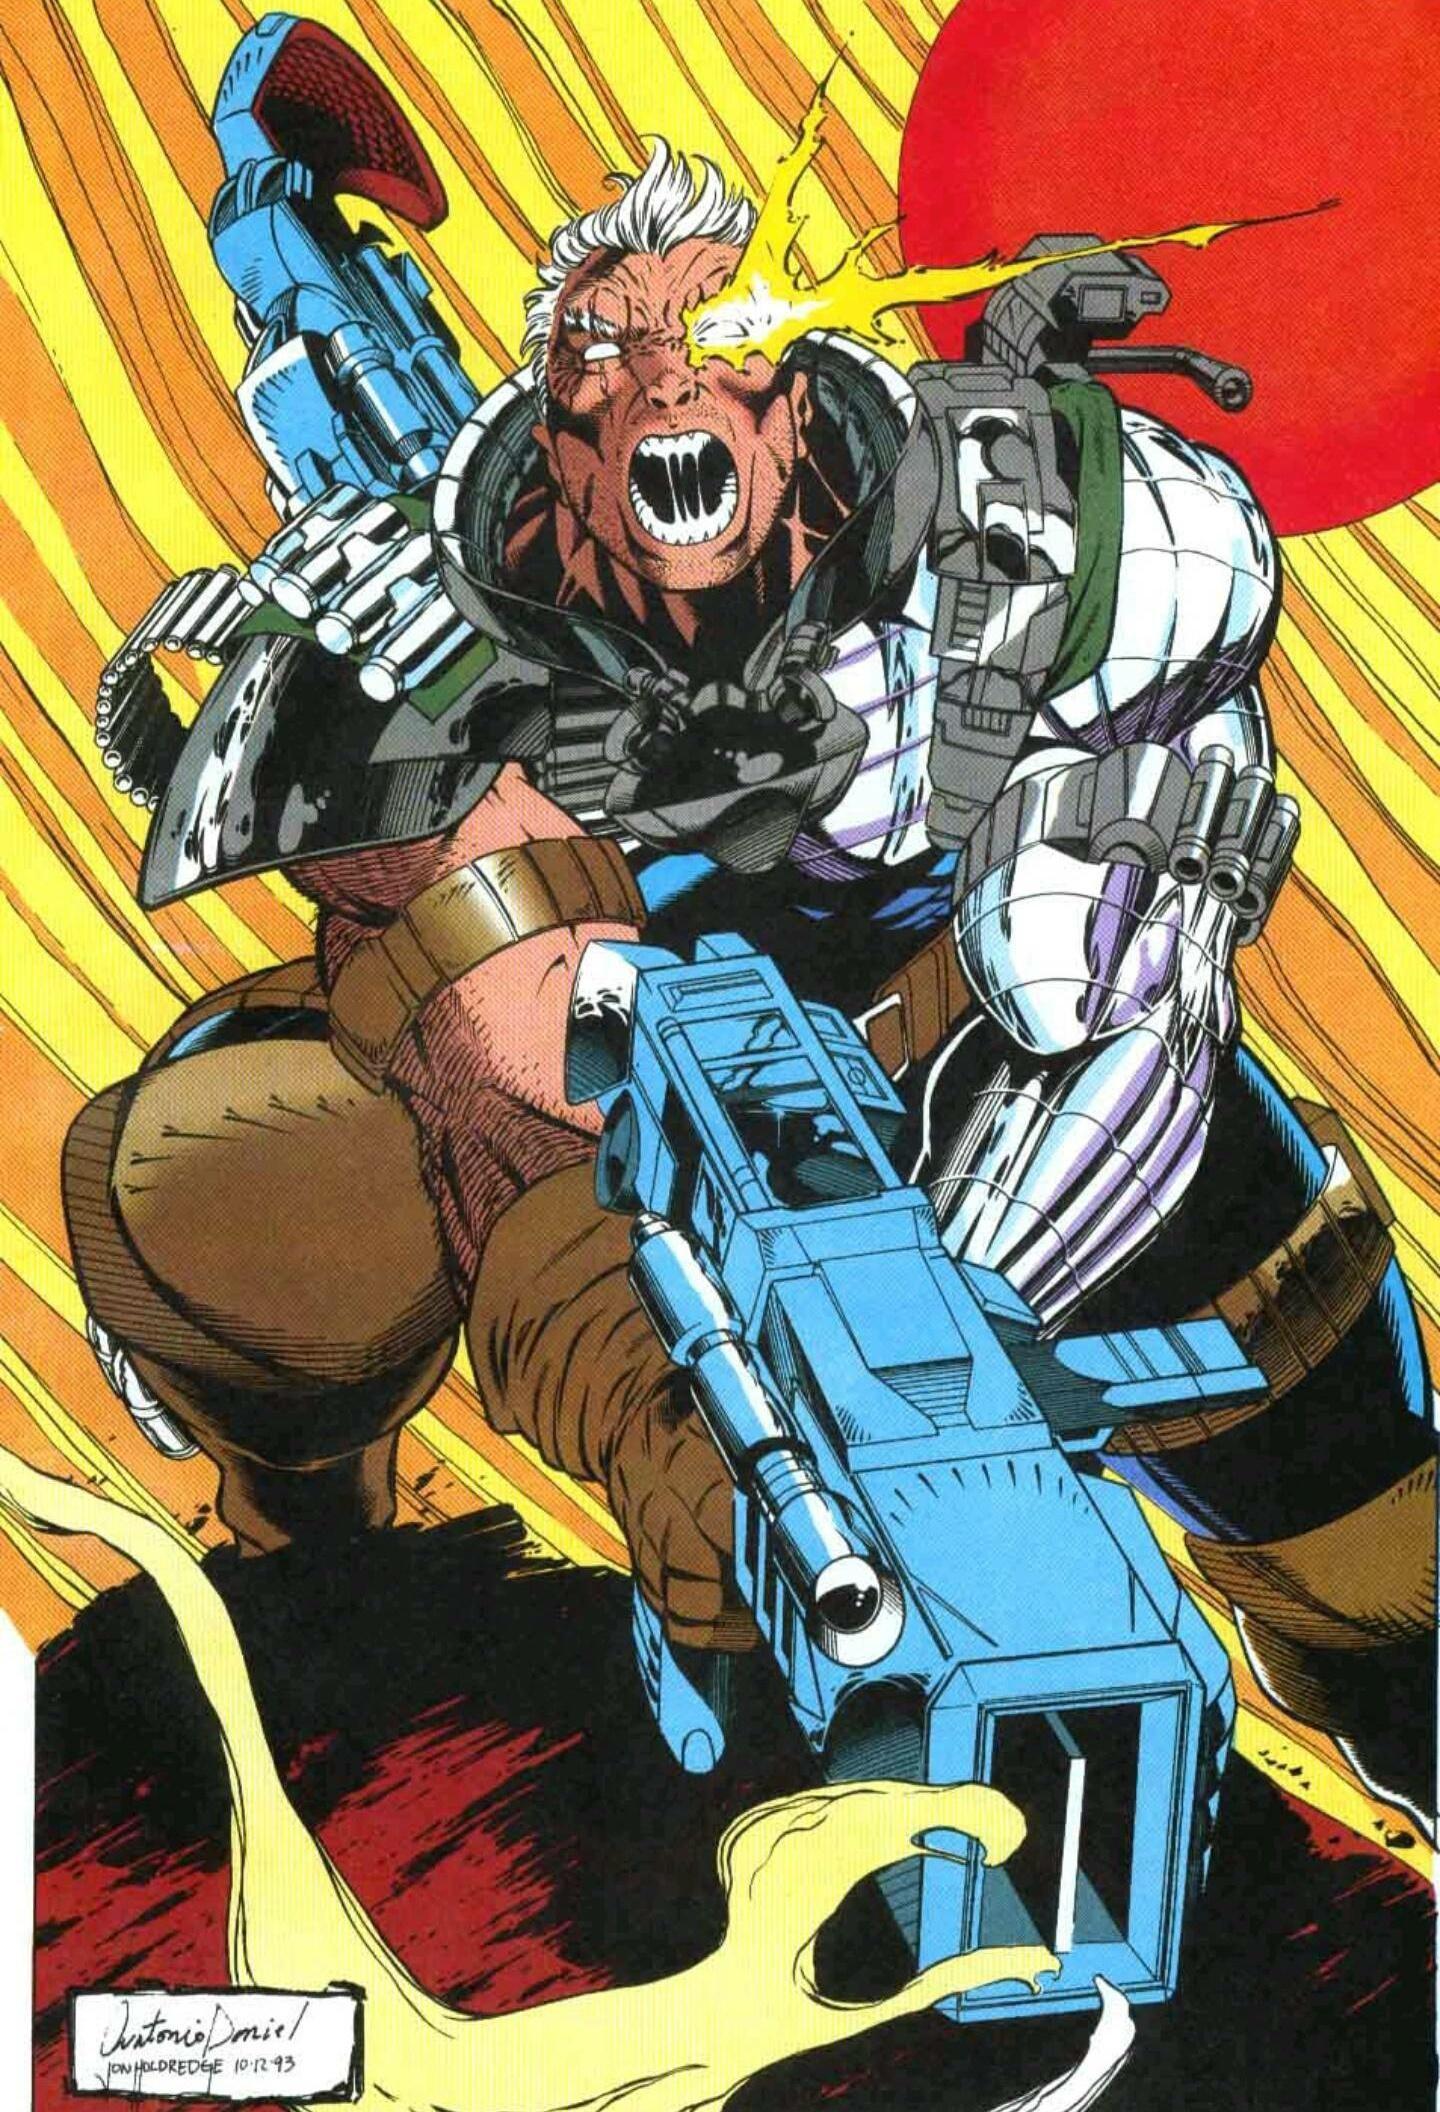 Mobile Wallpaper dump (Marvel Comics)